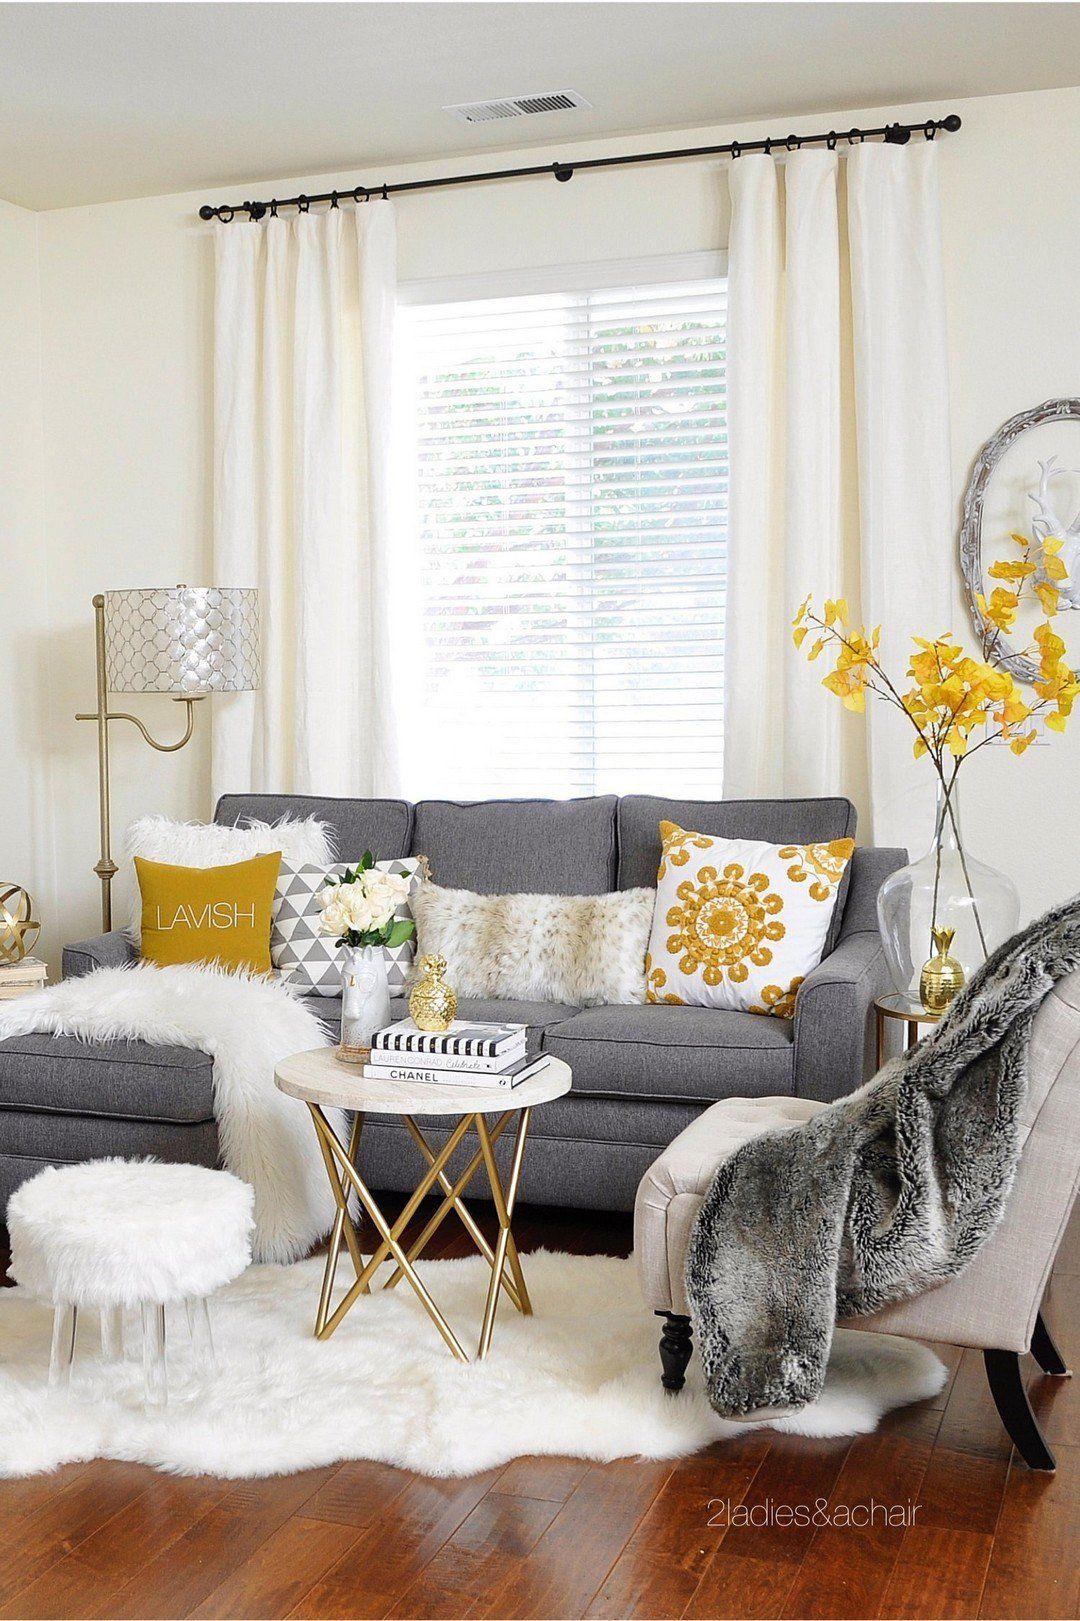 Small Gray Living Room Ideas Unique 99 Beautiful White And Grey Living Room Interior Decora Small Living Room Decor Small Modern Living Room Yellow Living Room #small #gray #living #room #ideas